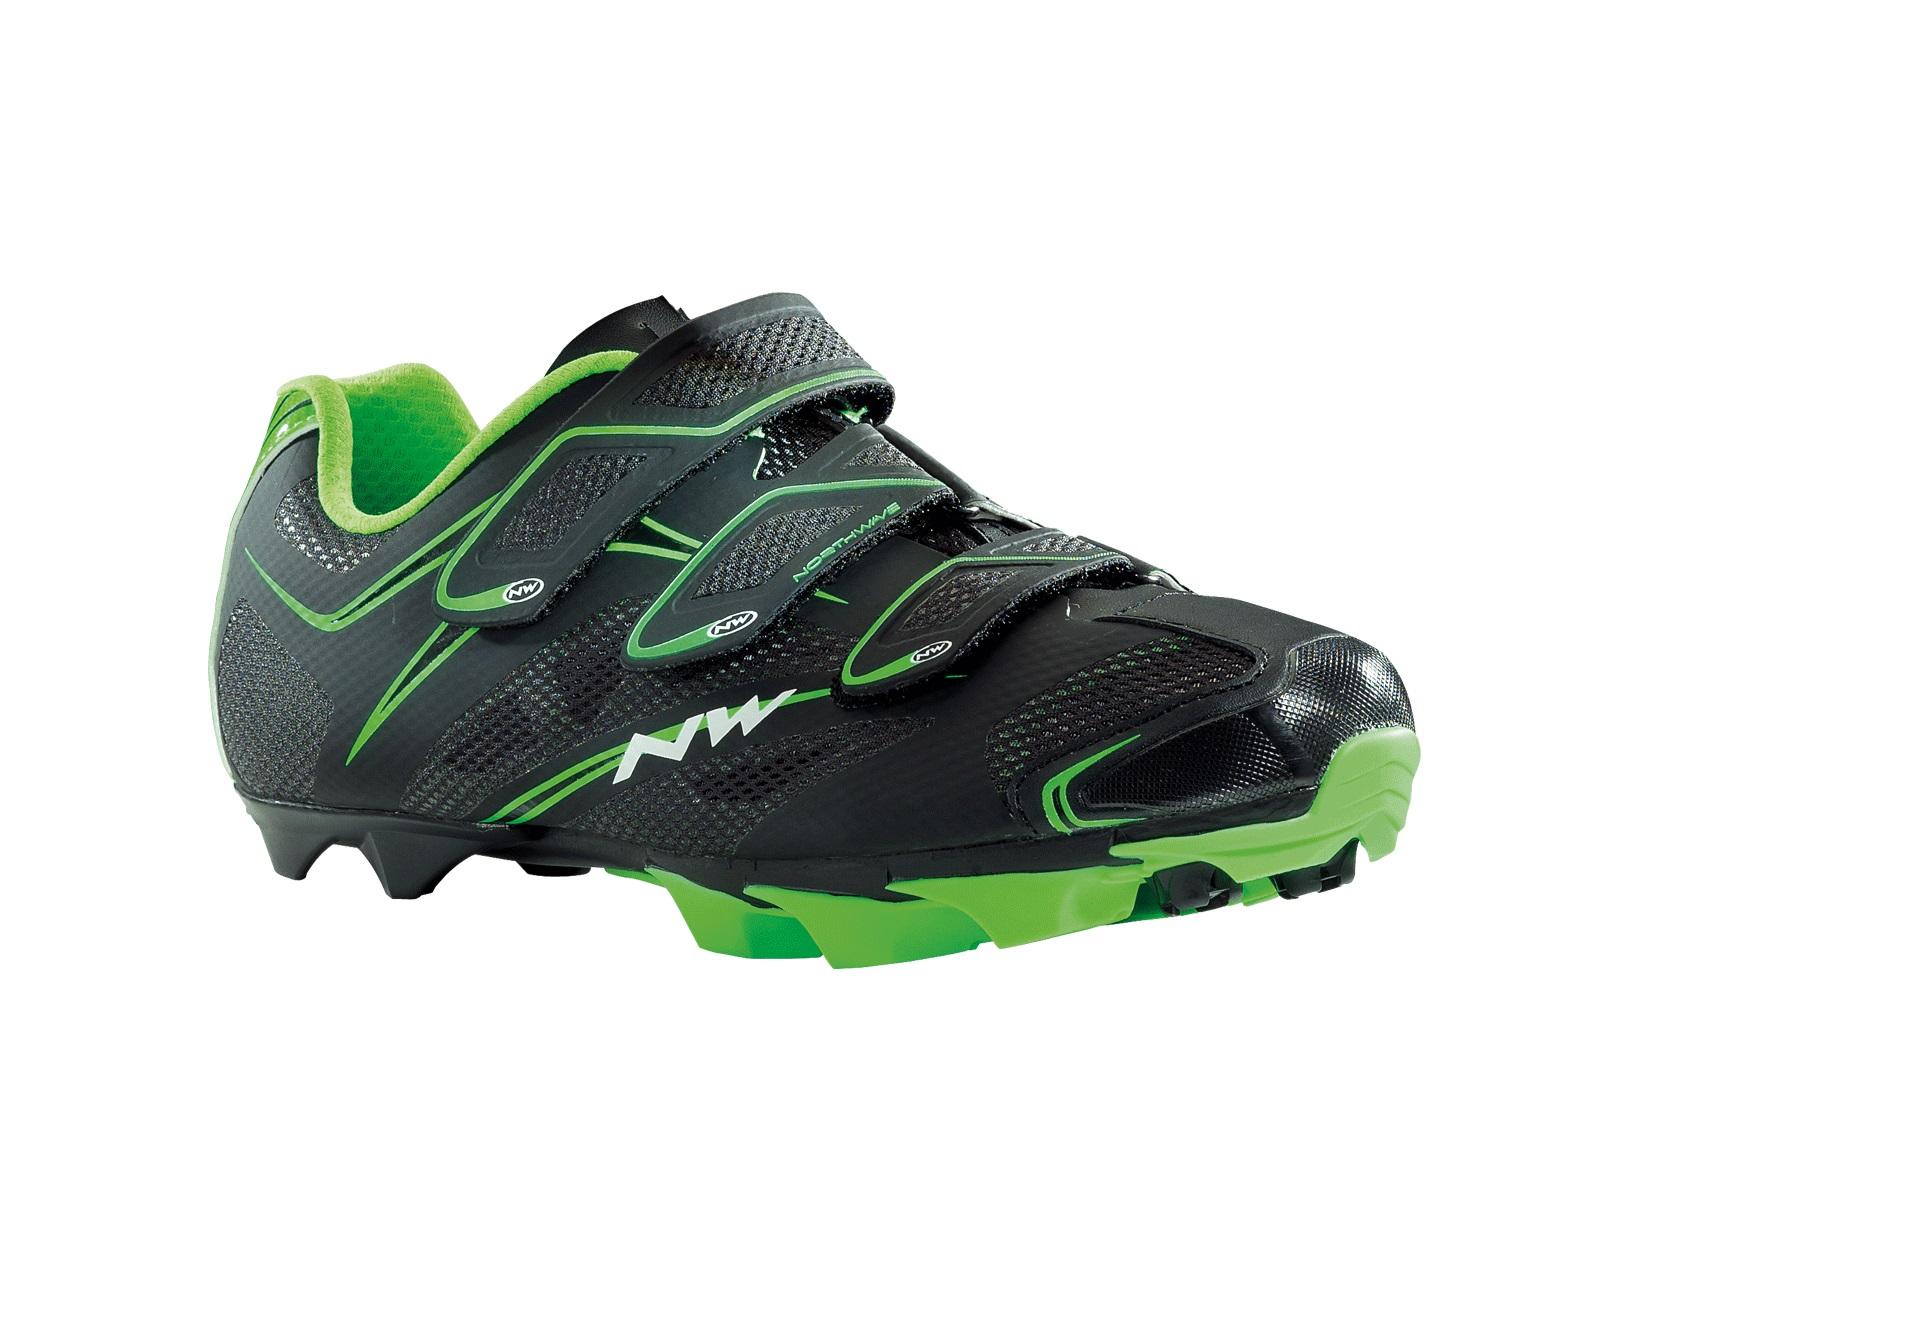 Chaussures NorthWave vertes homme h1LzDDB